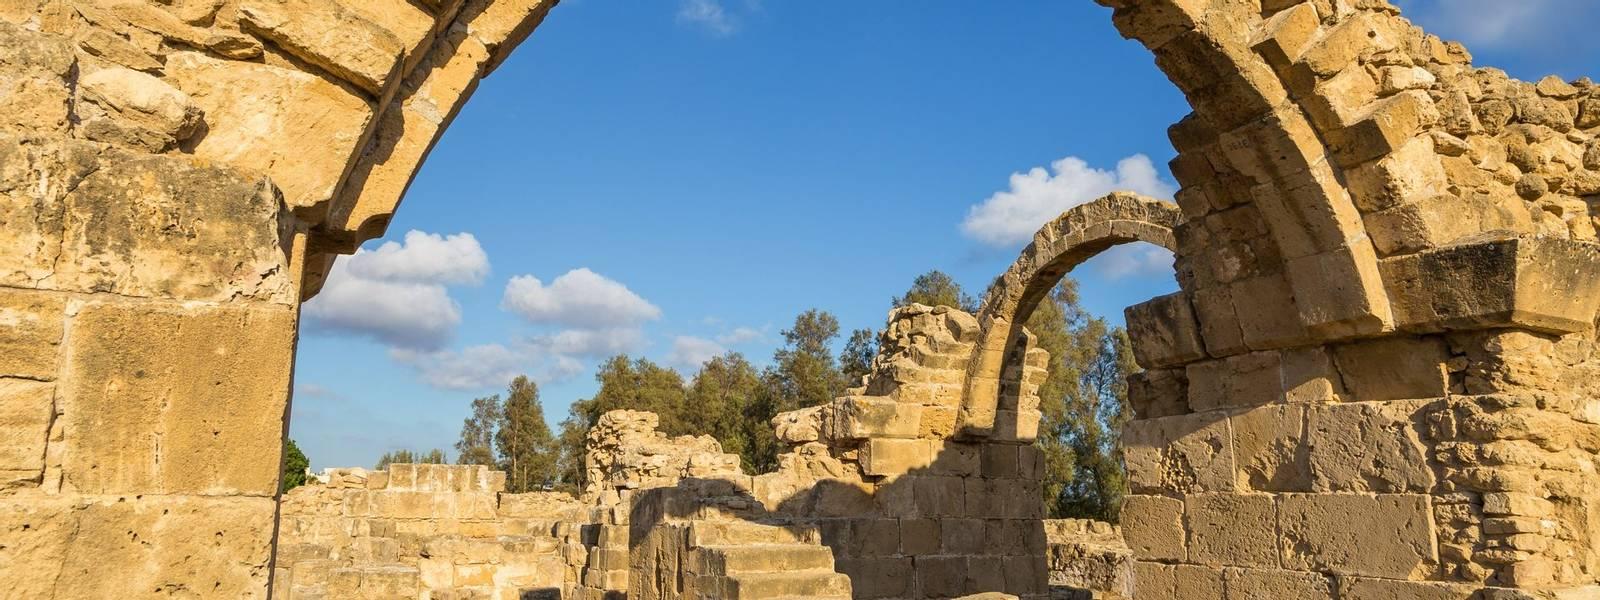 Cyprus-Paphos-AdobeStock_165940884.jpeg